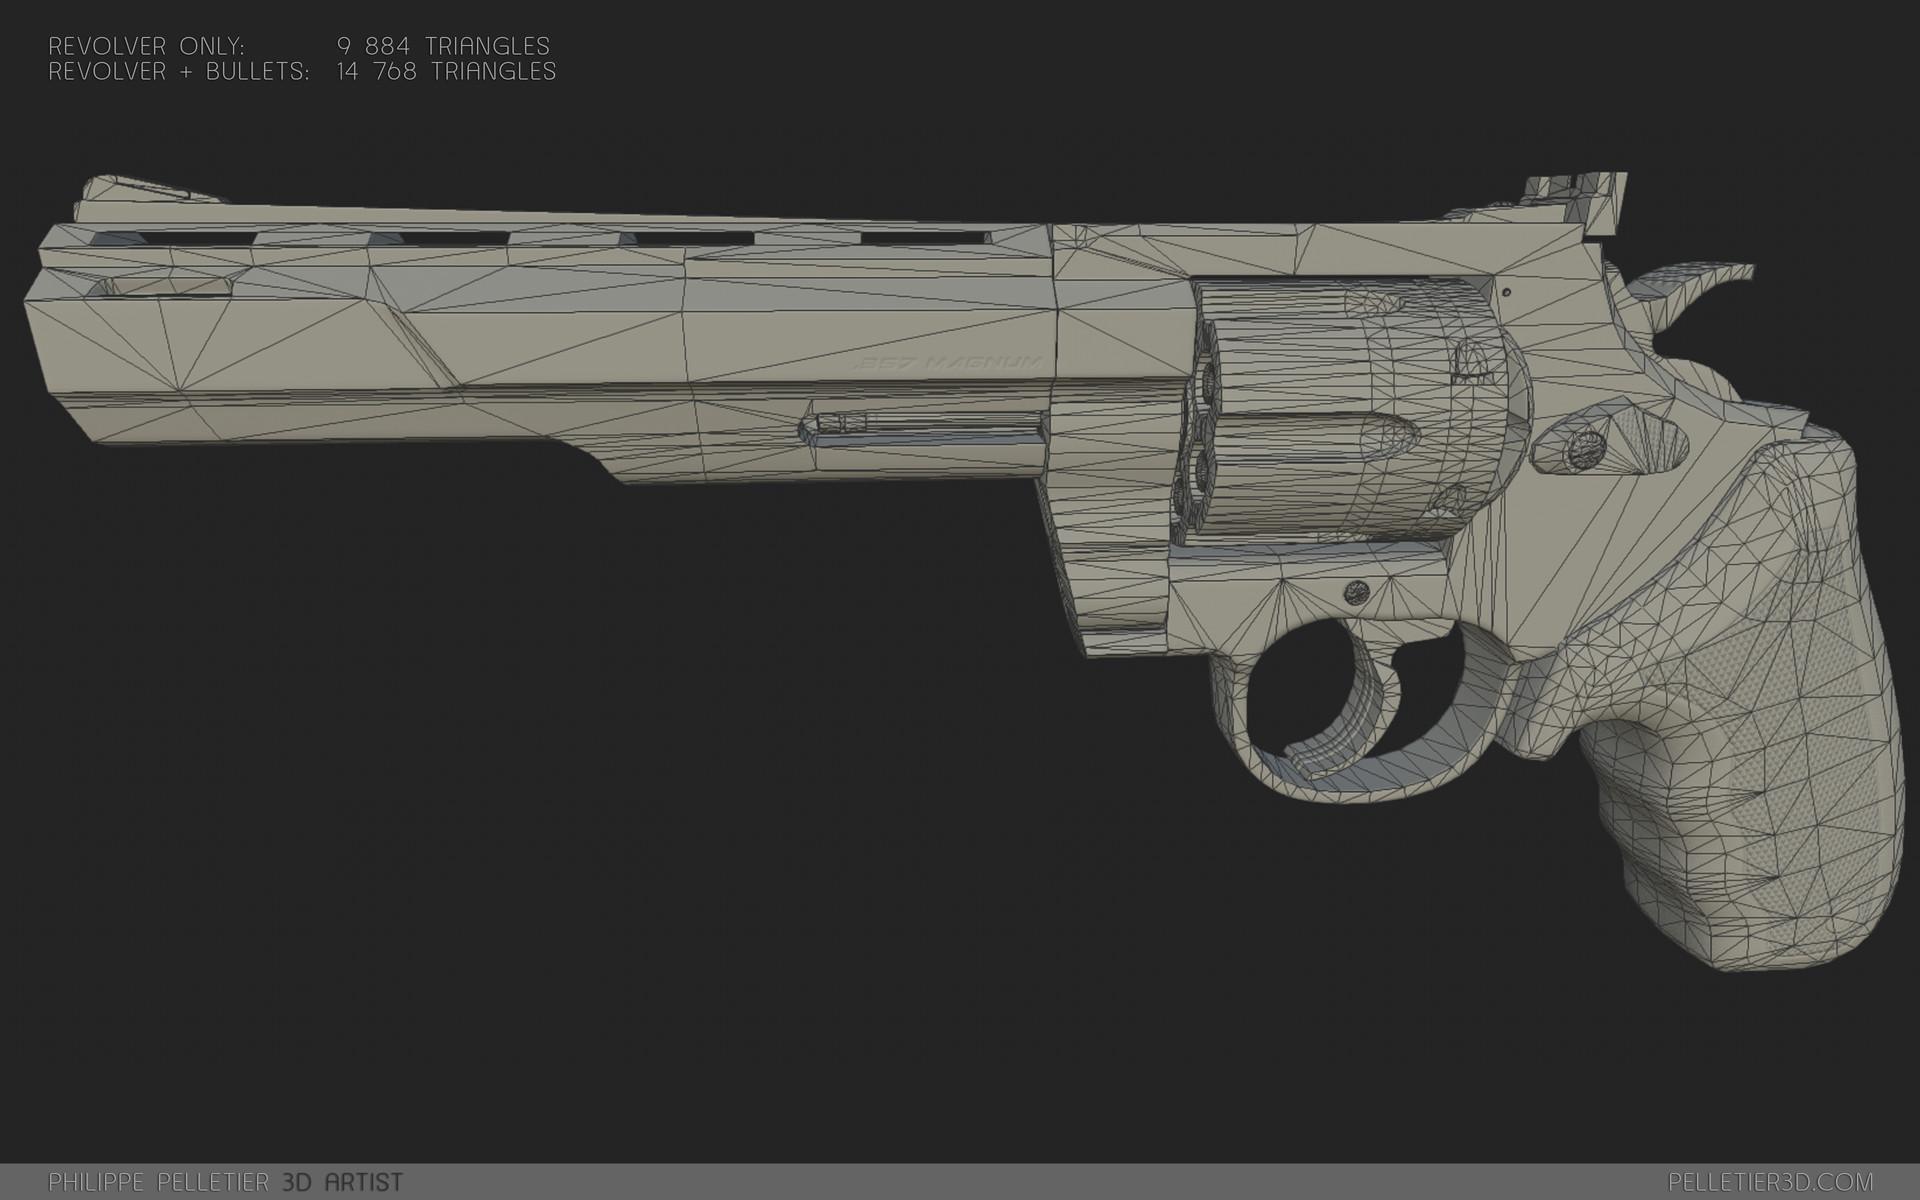 Philippe pelletier revolver 012